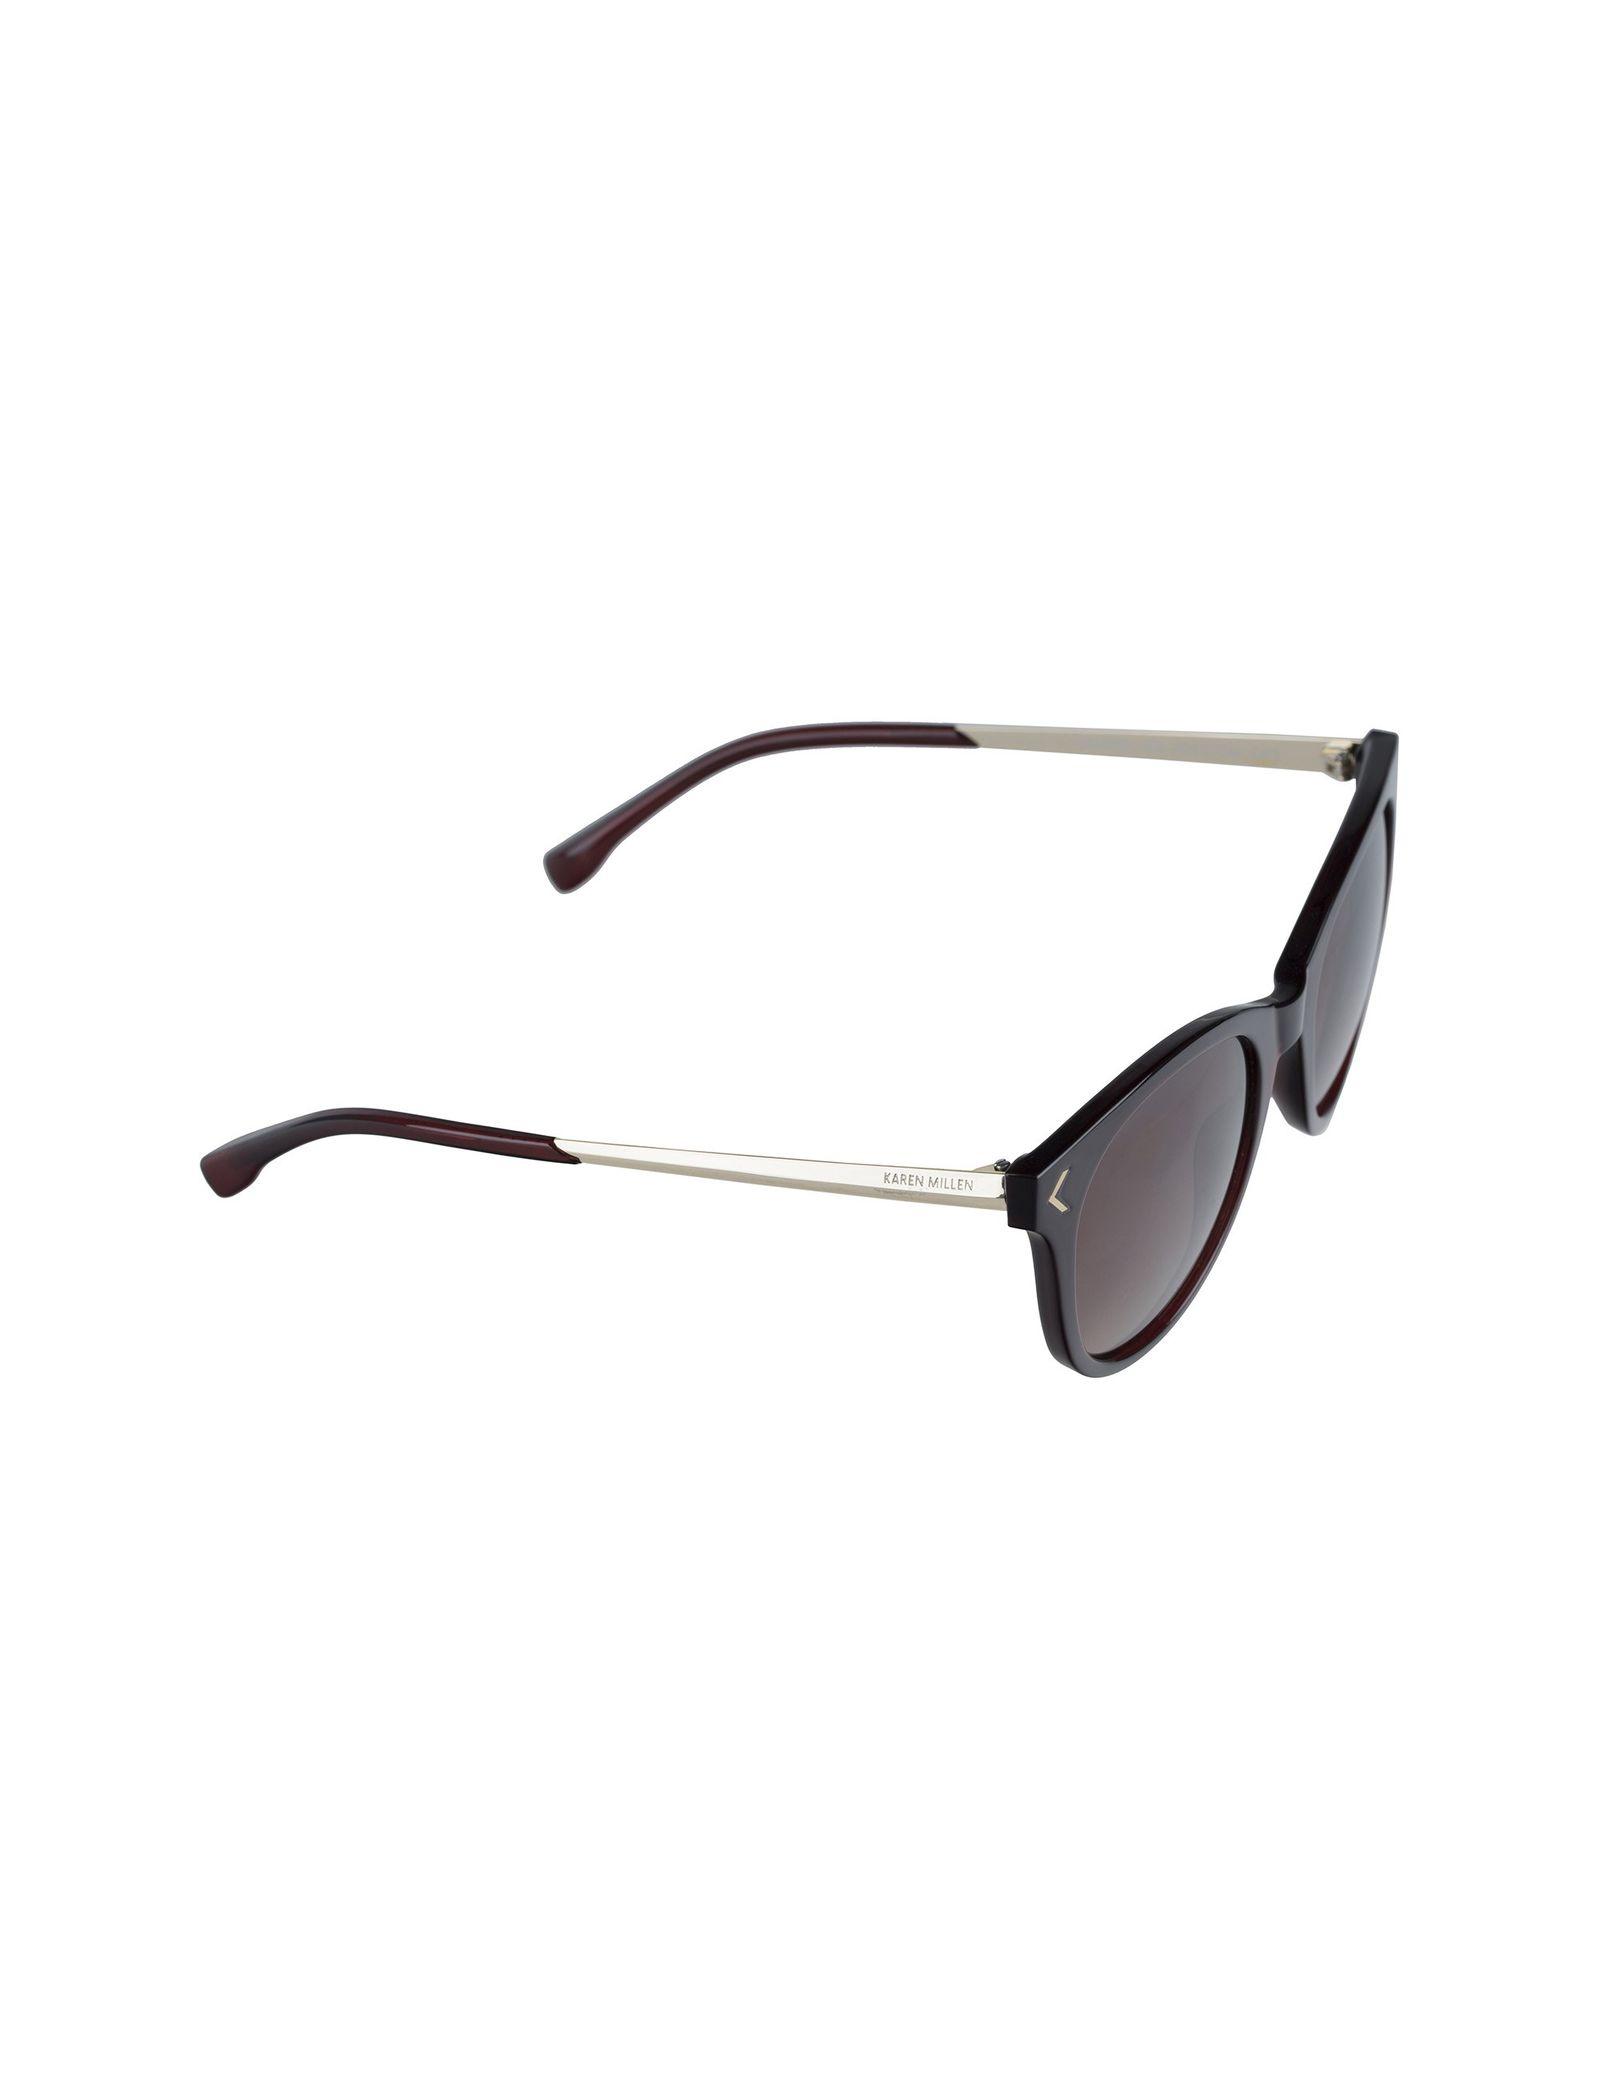 عینک آفتابی ویفرر زنانه - کارن میلن - قهوه اي - 3